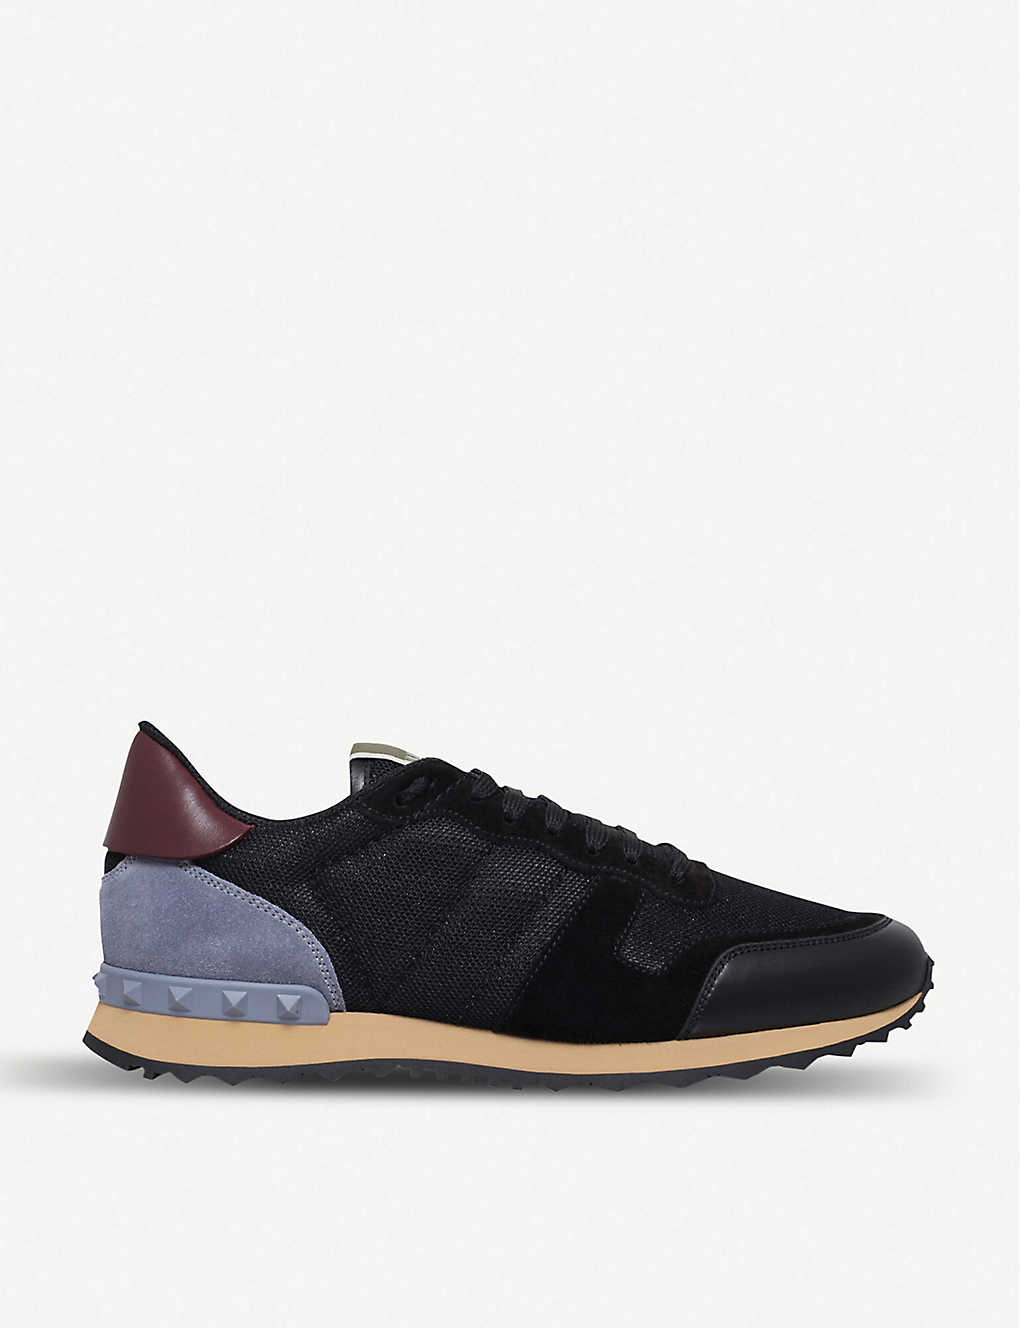 c455ae838bac VALENTINO - Garavani Rockrunner leather